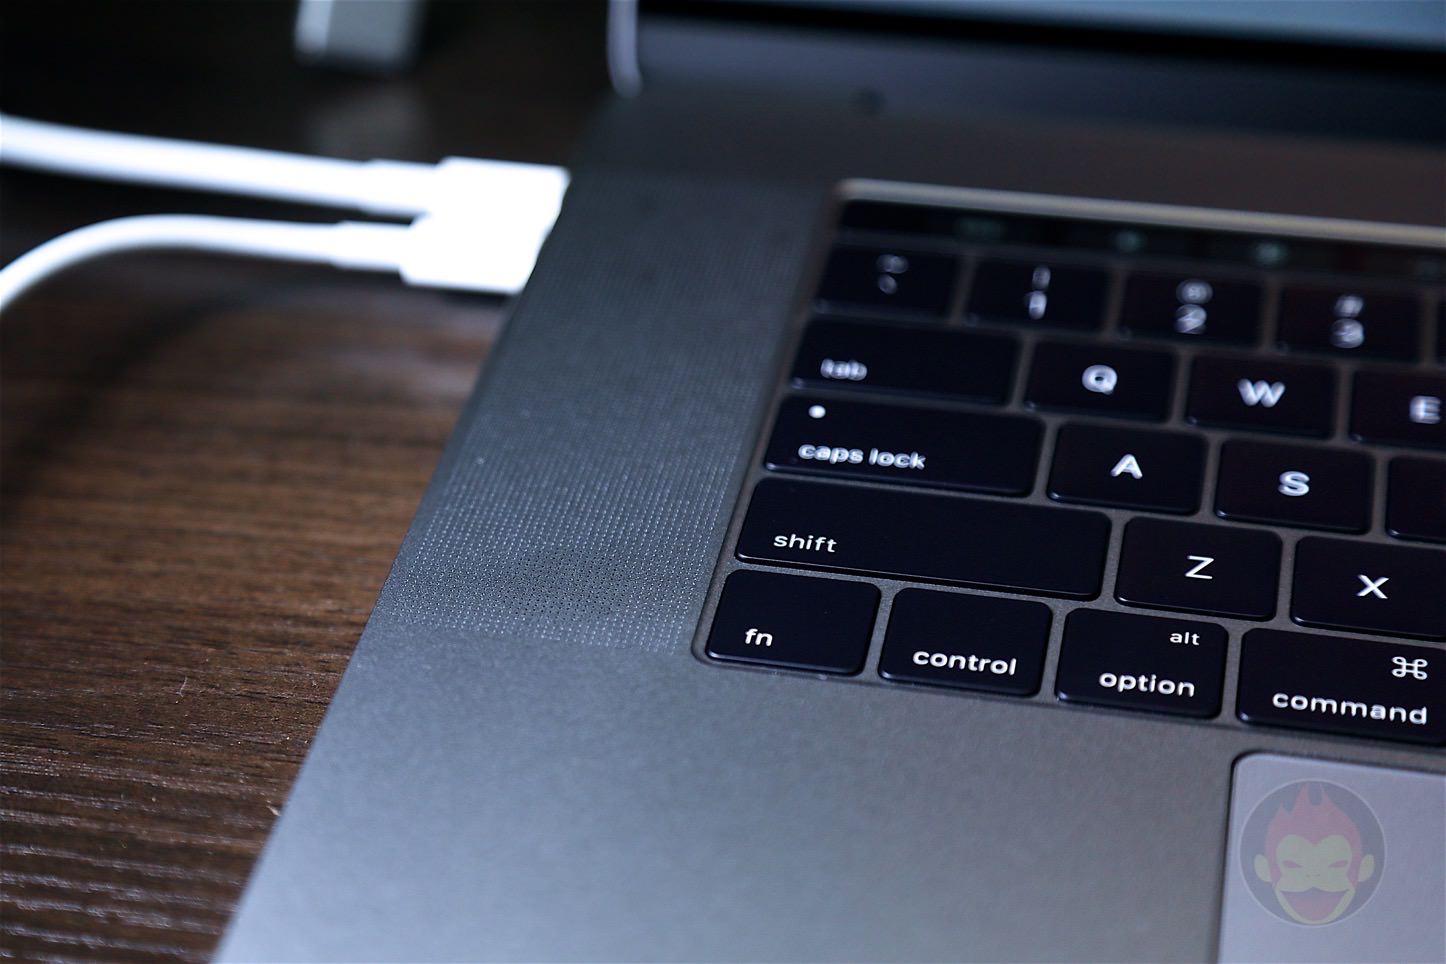 MacBook-Pro-Late-2016-15inch-model-14.jpg